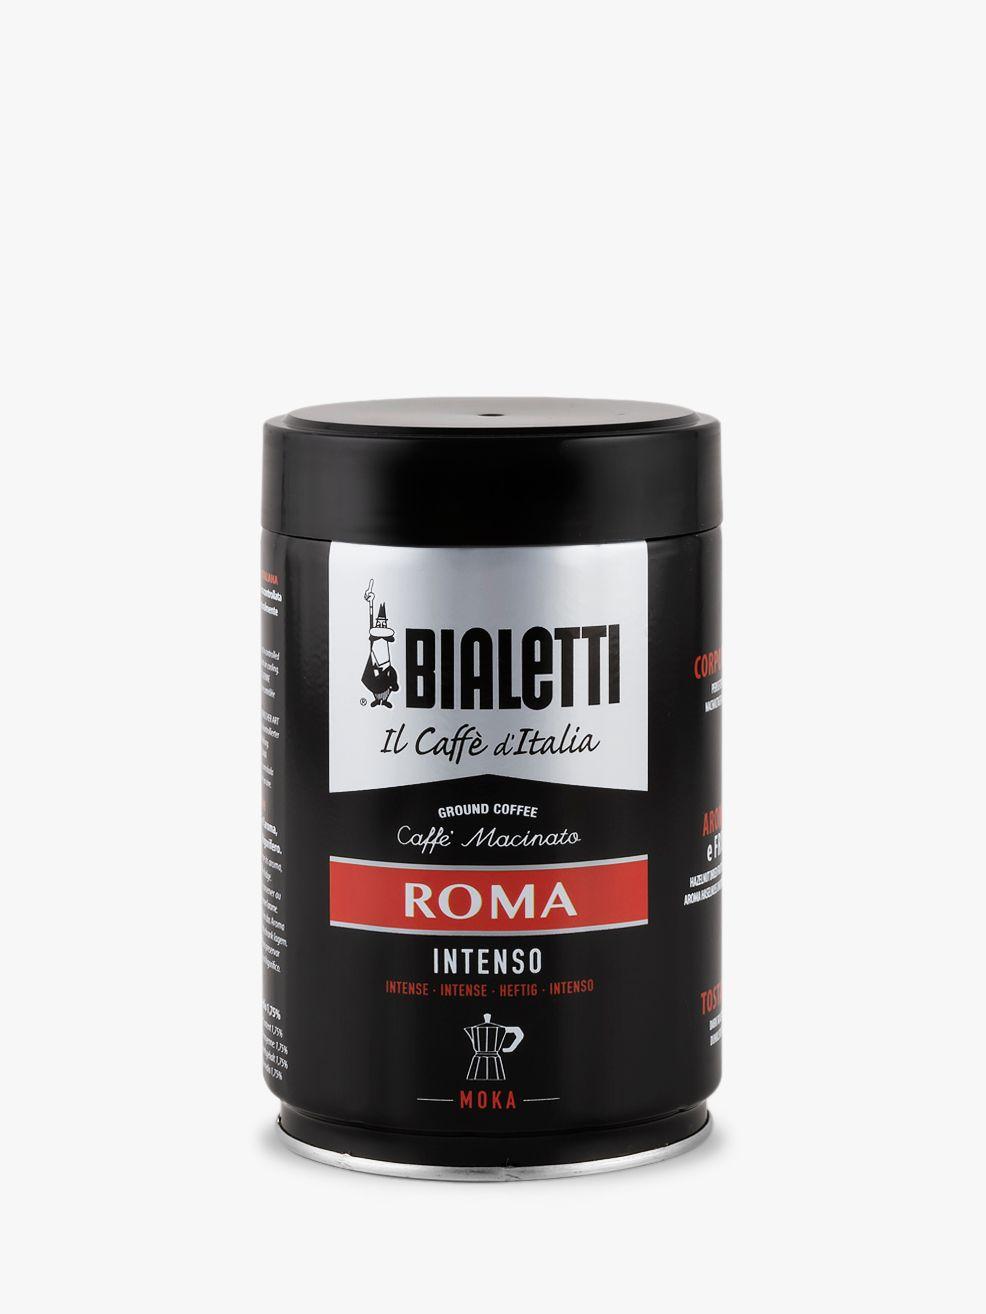 Bialetti Bialetti Roma Ground Coffee, 250g